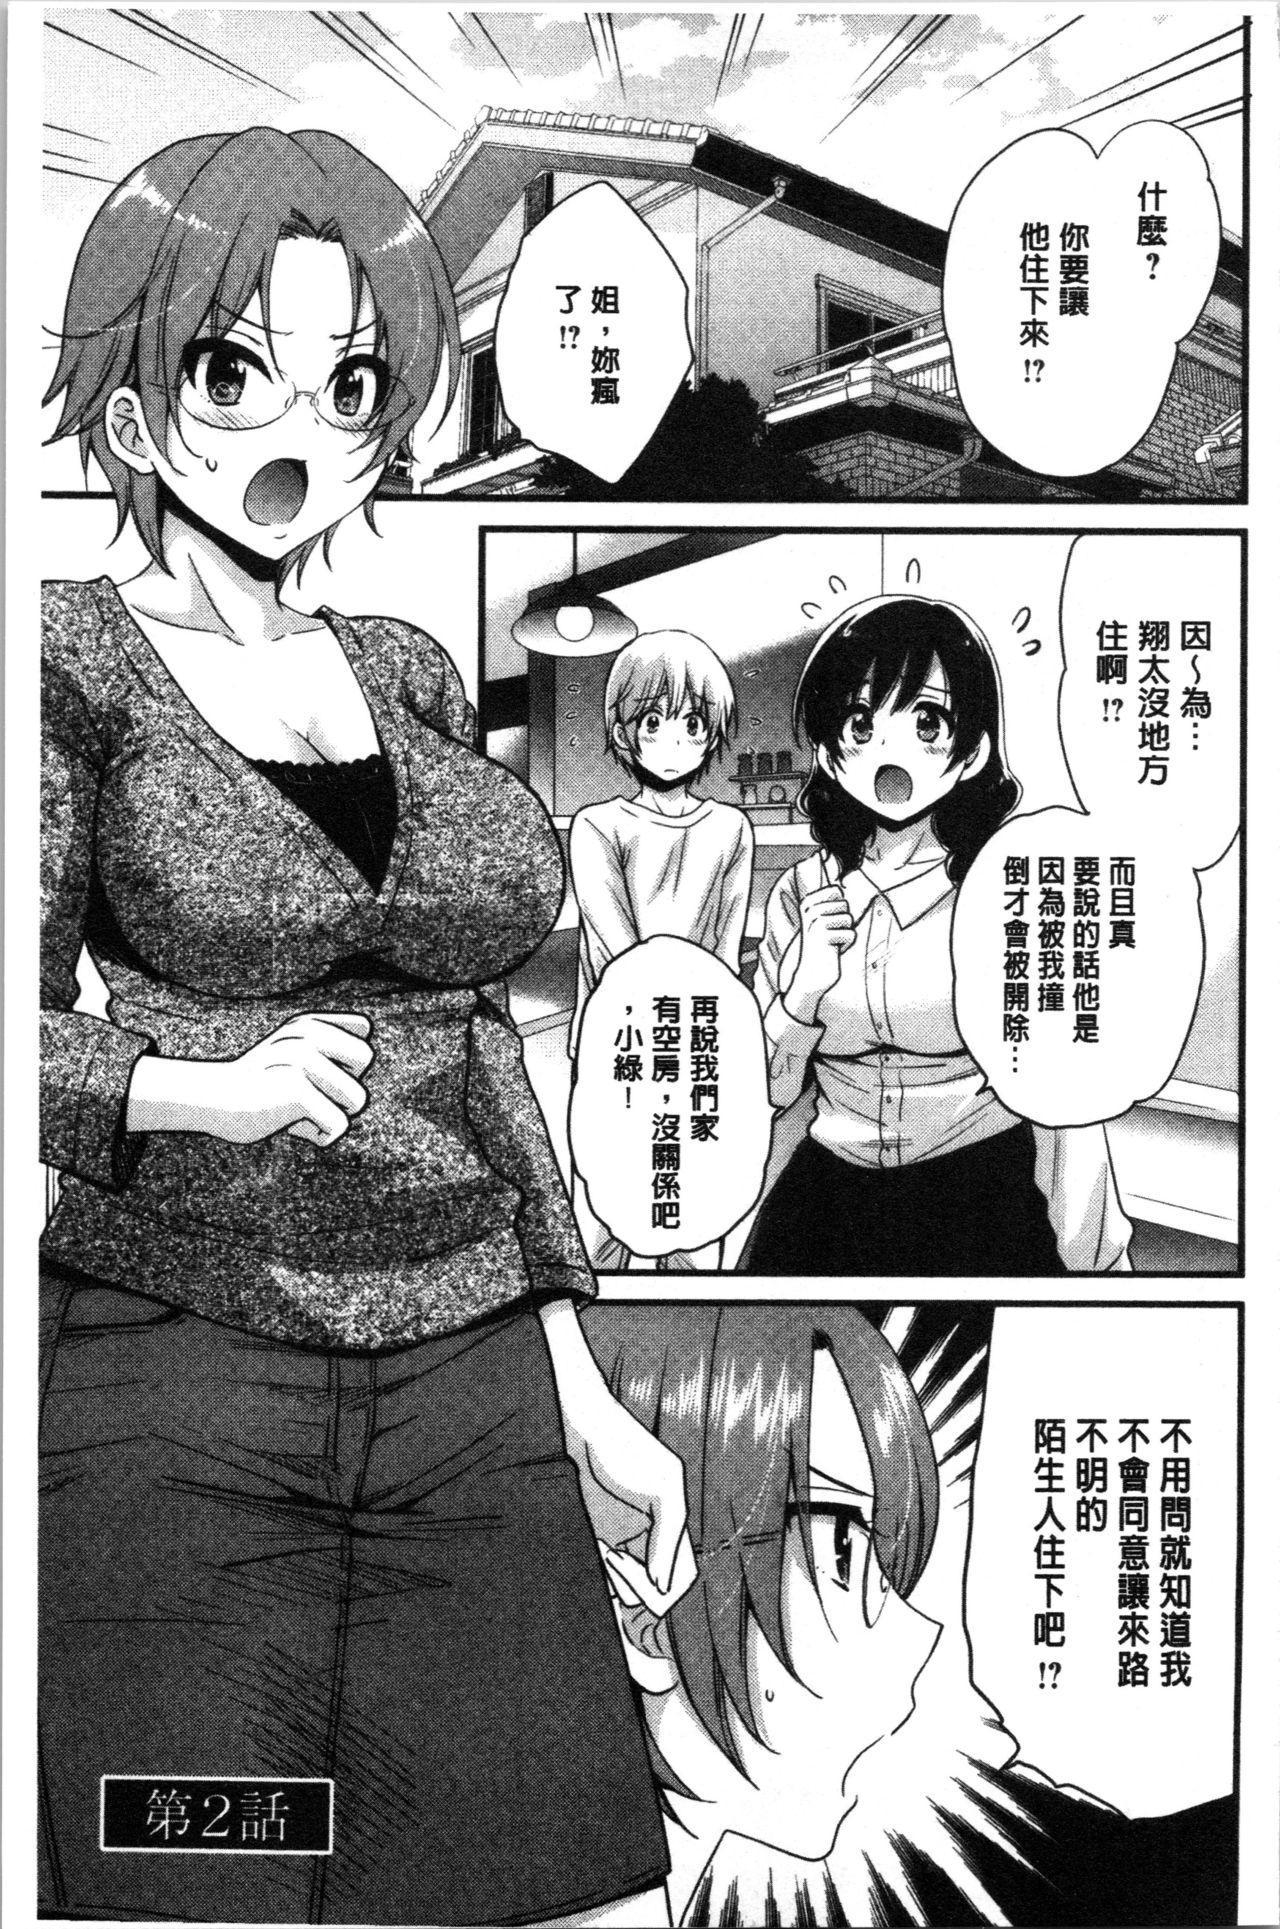 Ottori Midarana Mikami-san   嫻淑優雅又淫亂的三上小姐 23